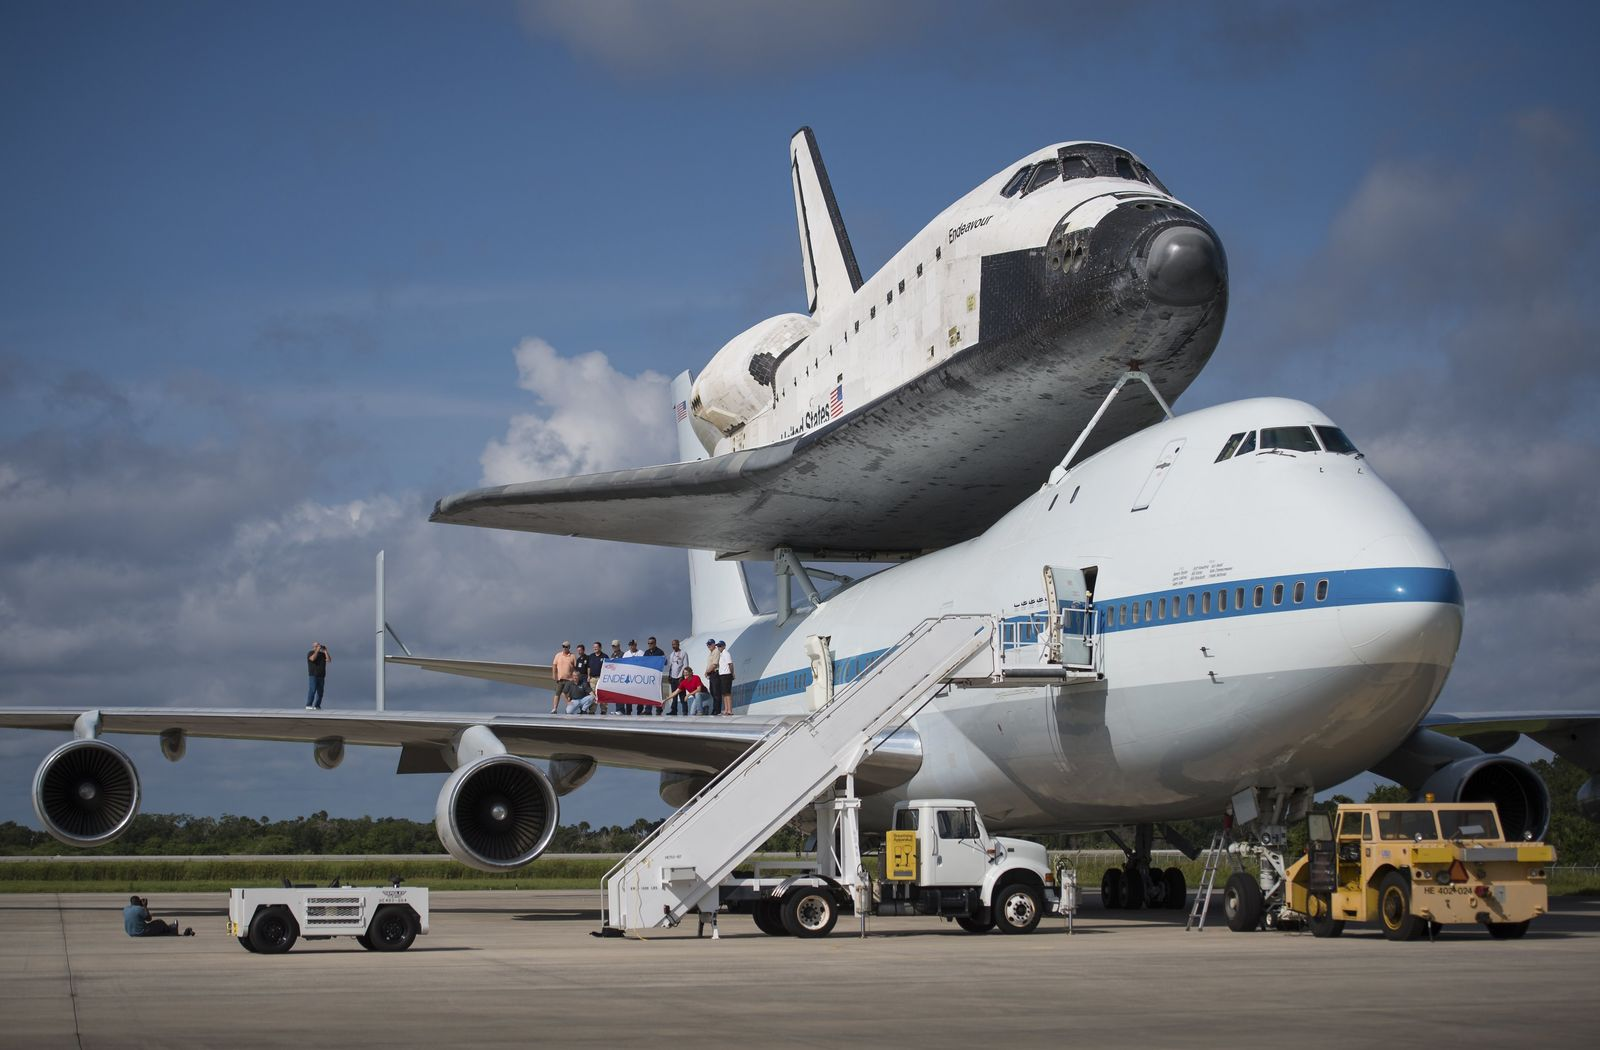 SPACESHUTTLE/Endeavour